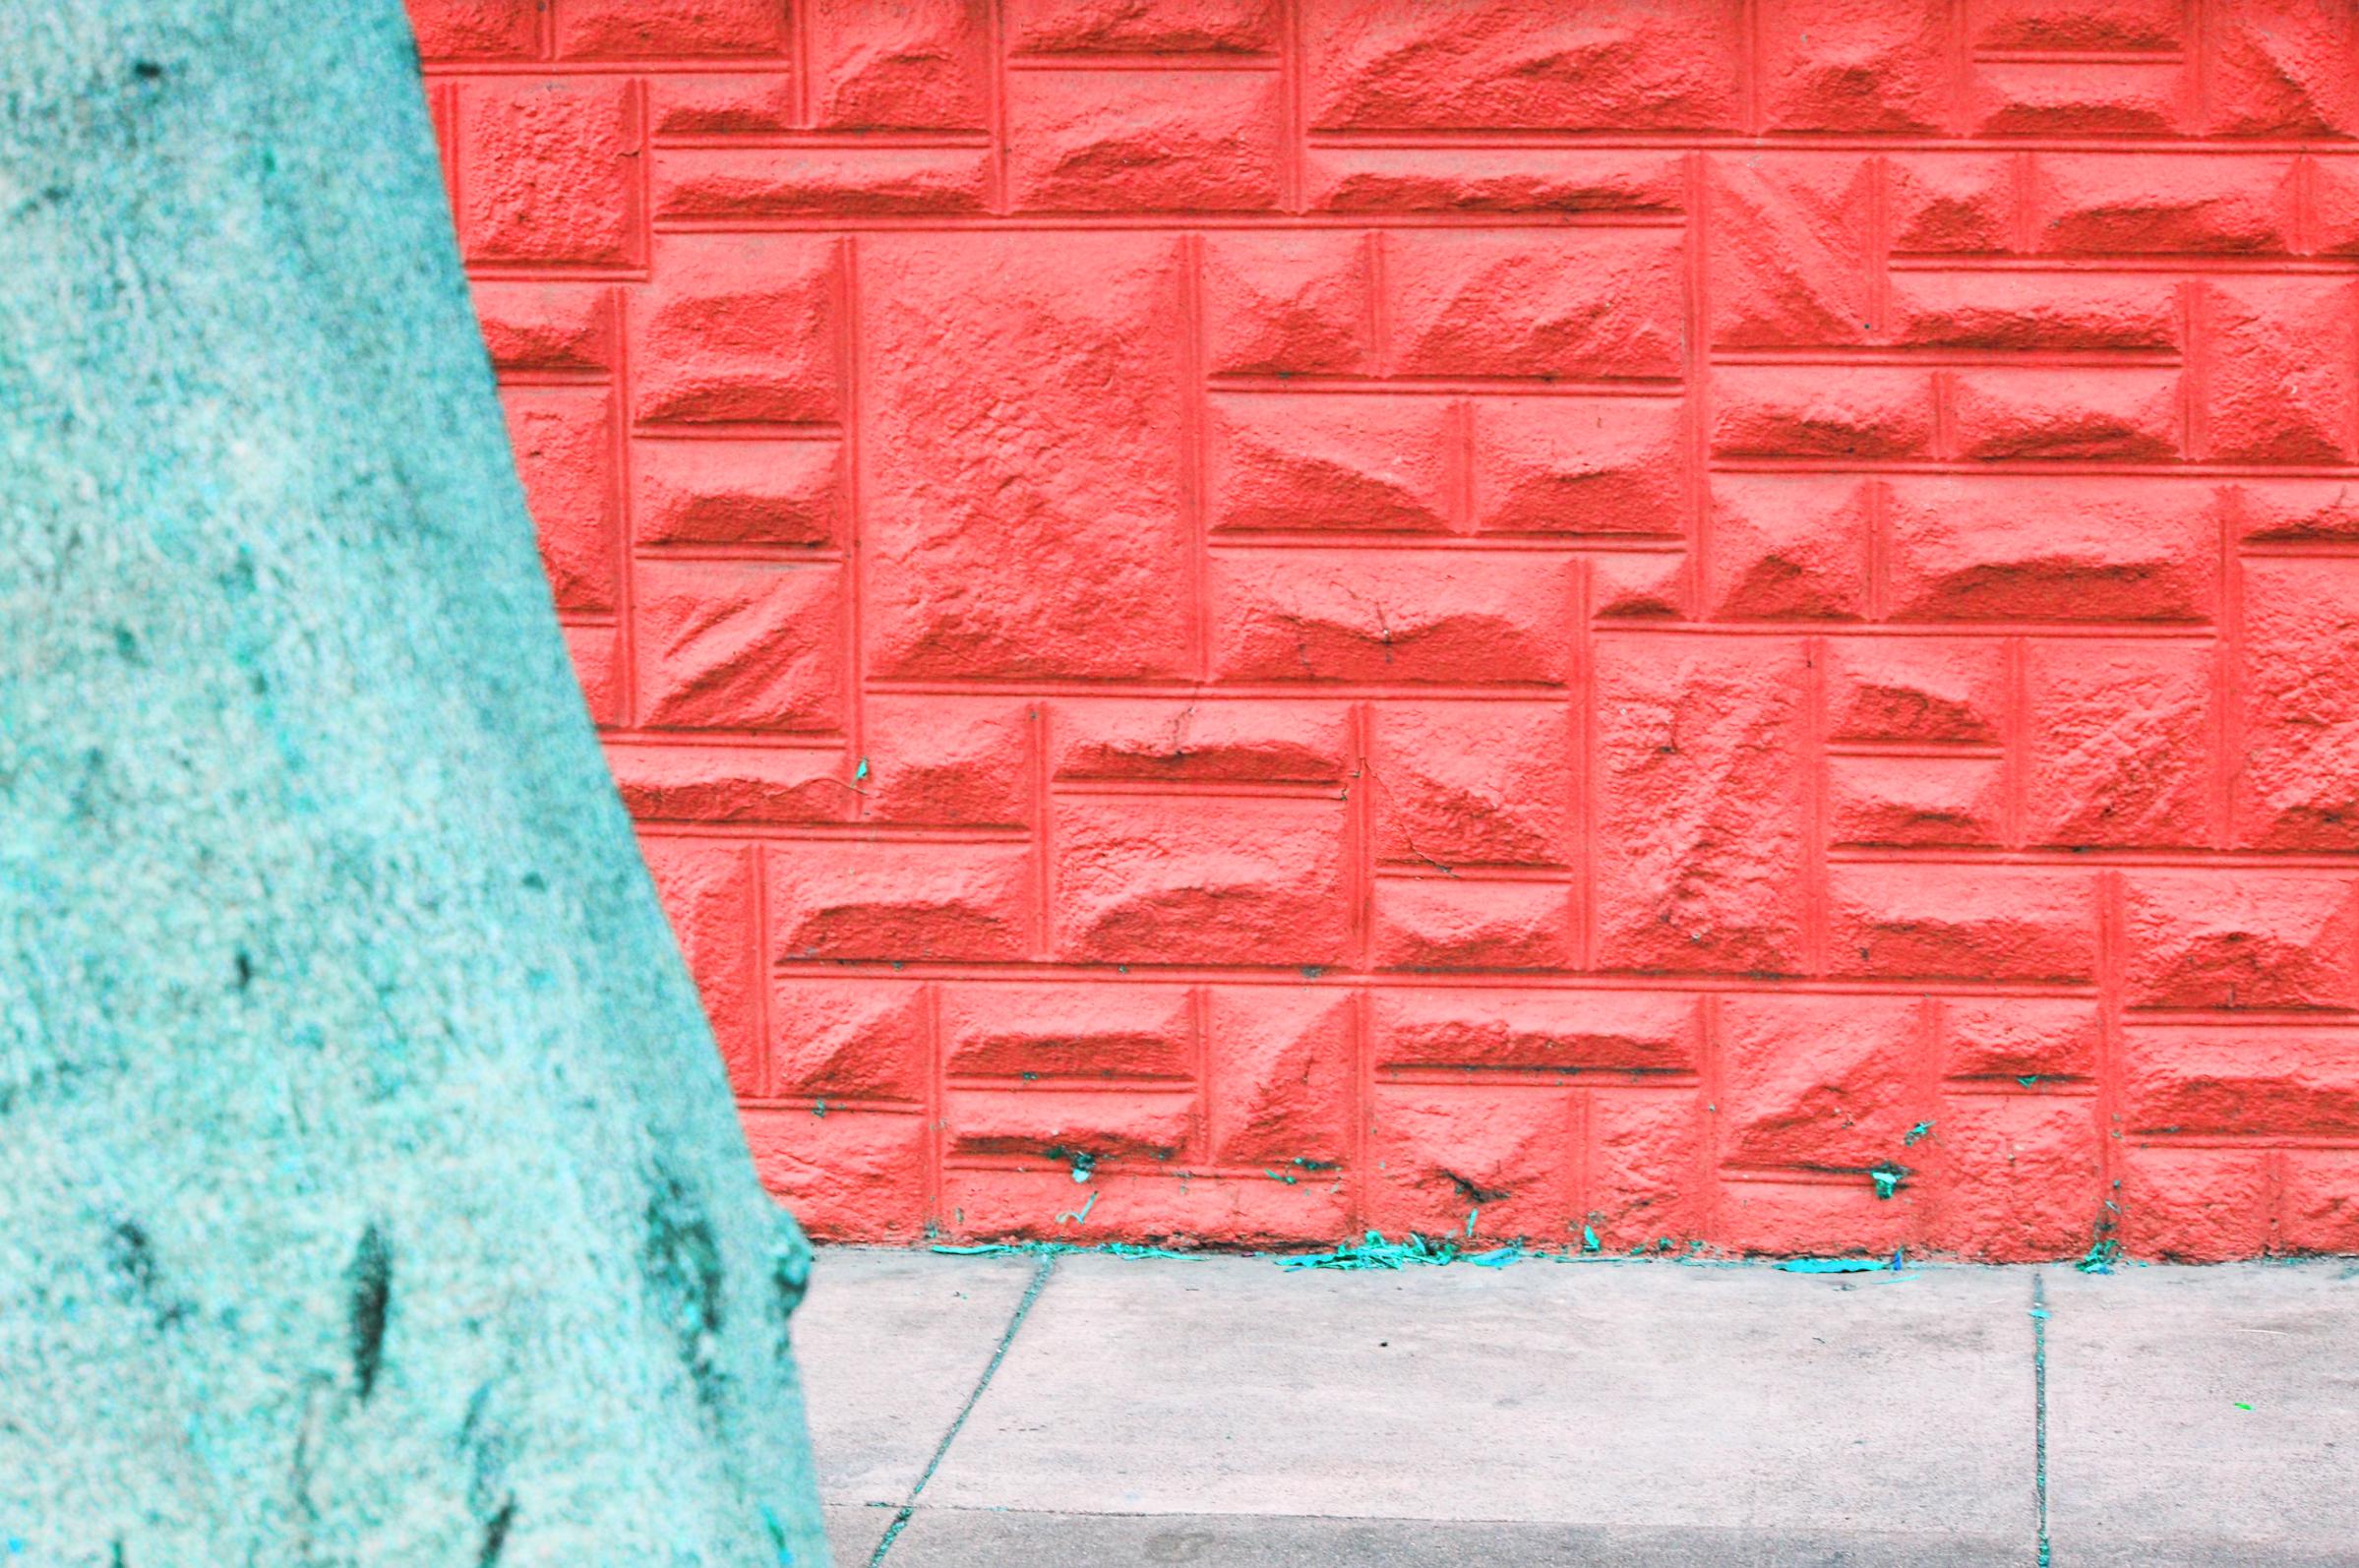 Aliana Grace Bailey San Francisco California Houses Texture 2.png